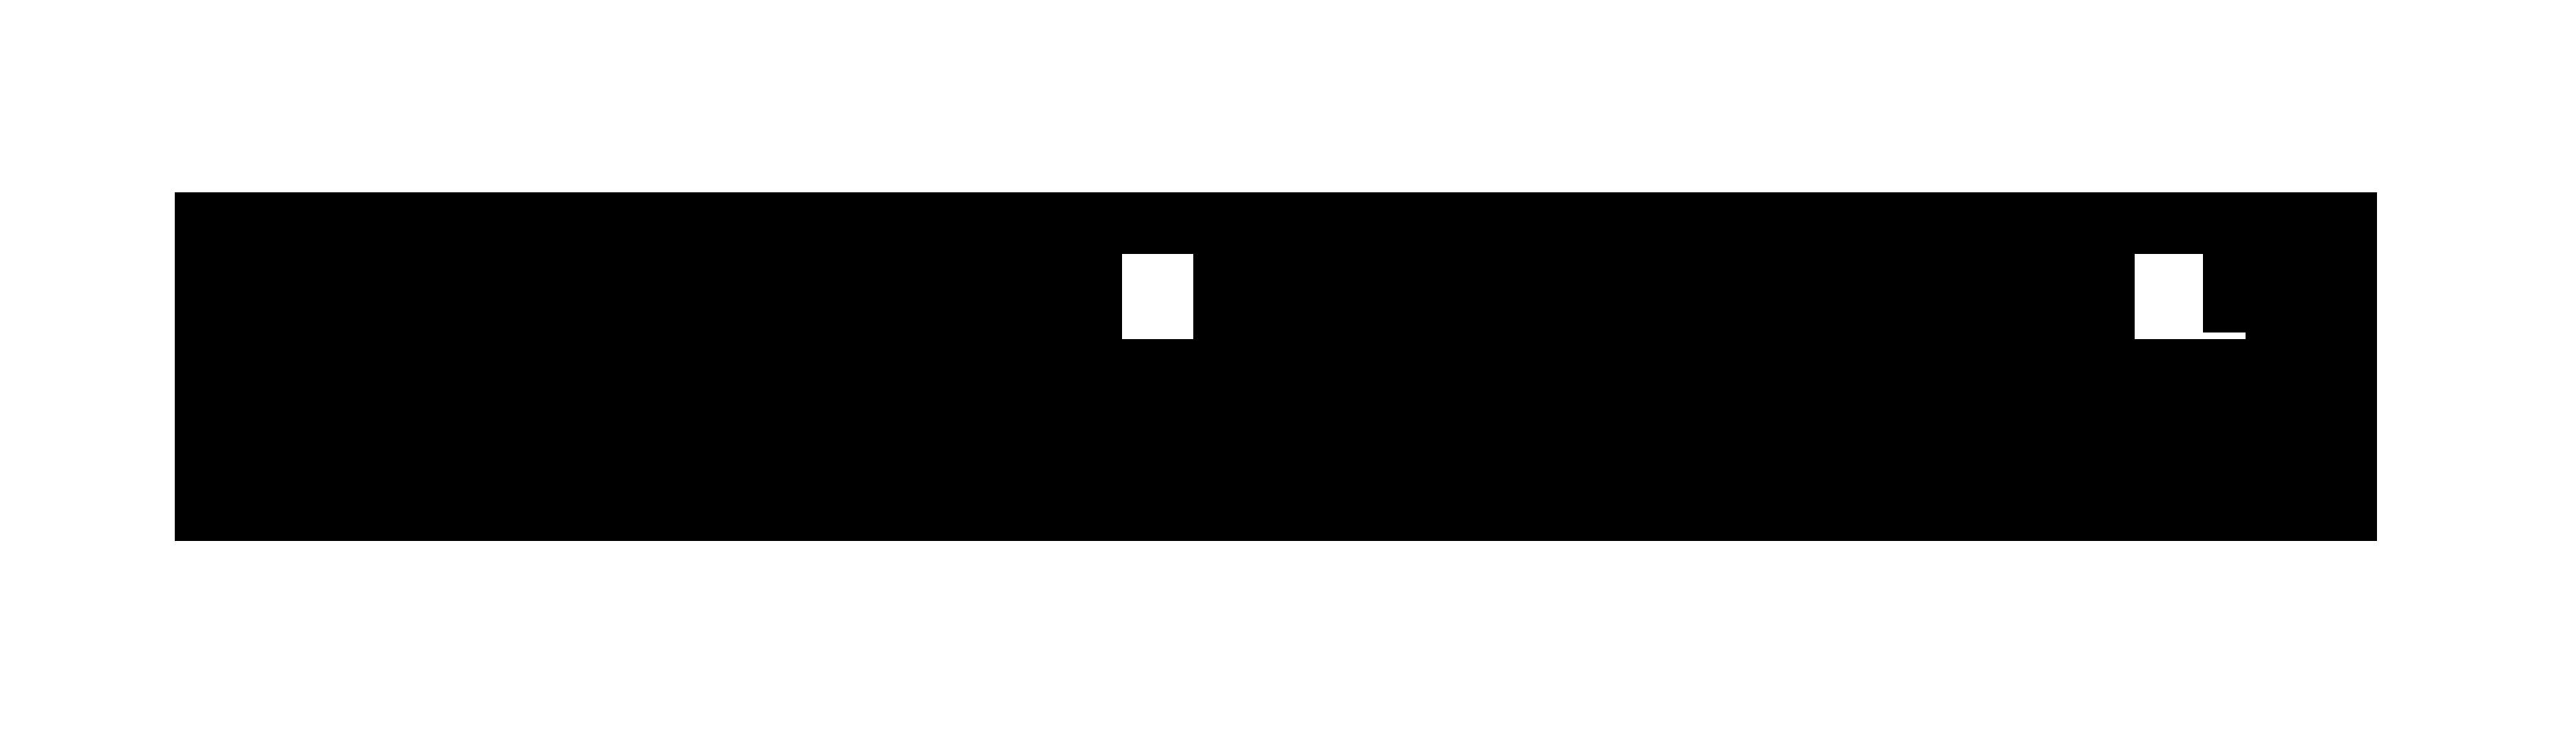 Fosphor